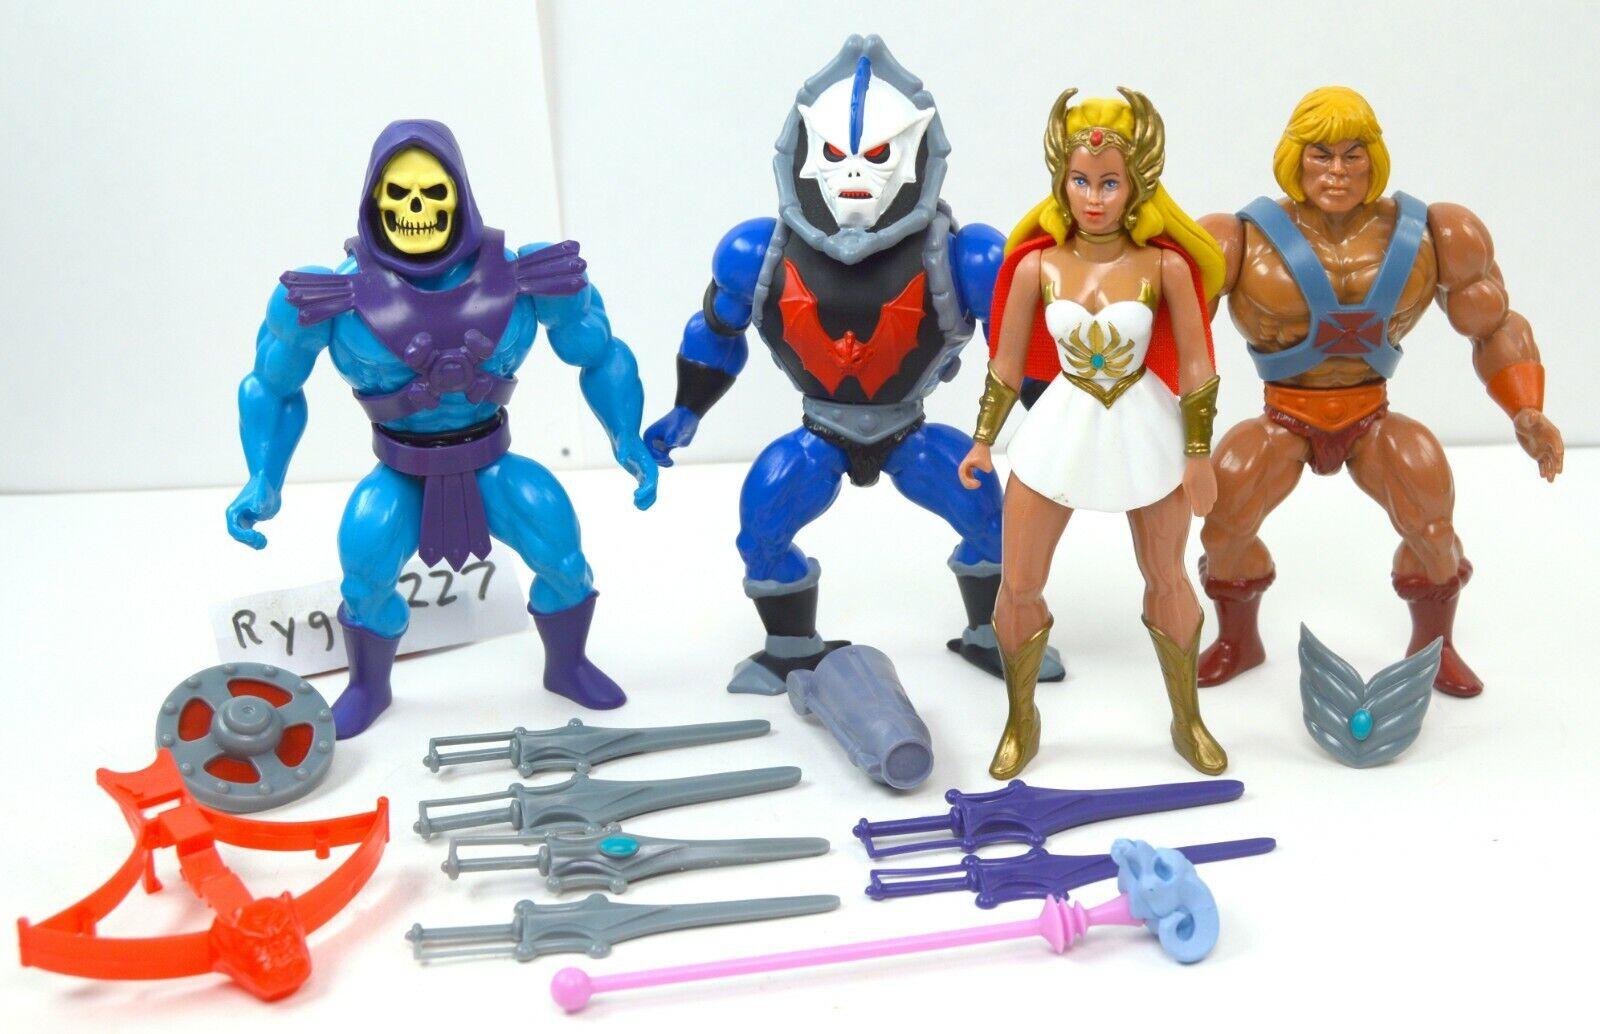 MOTU, He-Man Lot Filmation Style, Masters of the Universe, Super7, figure, set